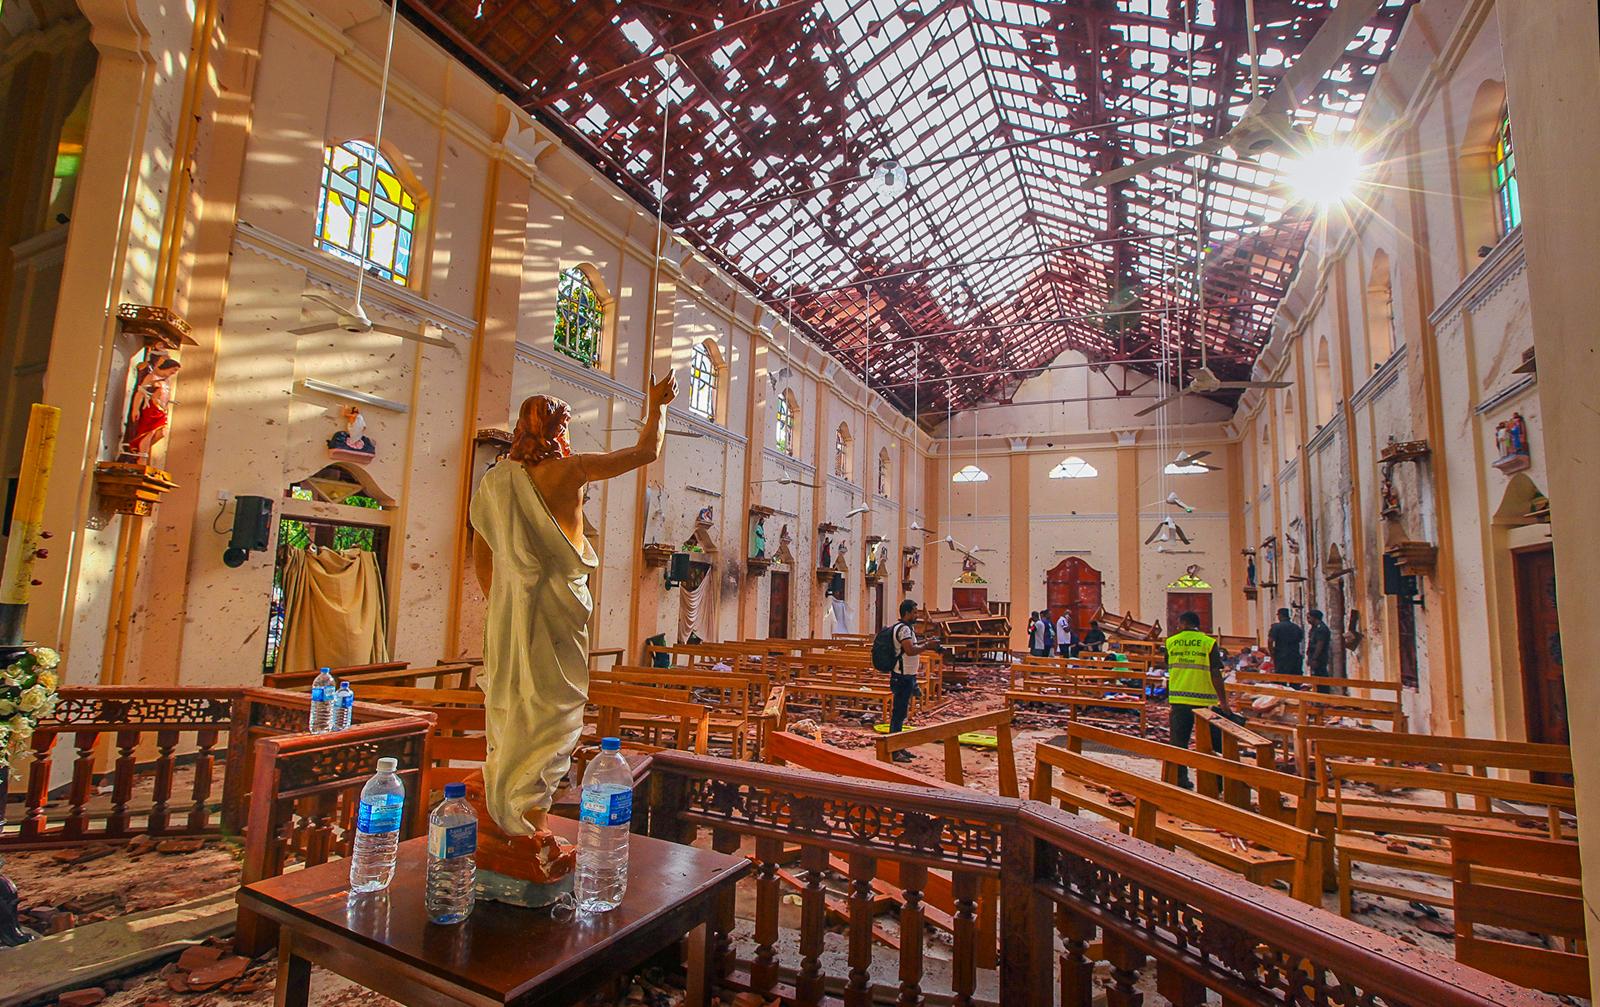 A view of St. Sebastian's Church damaged in blast in Negombo, north of Colombo, Sri Lanka, Sunday, April 21, 2019. AP